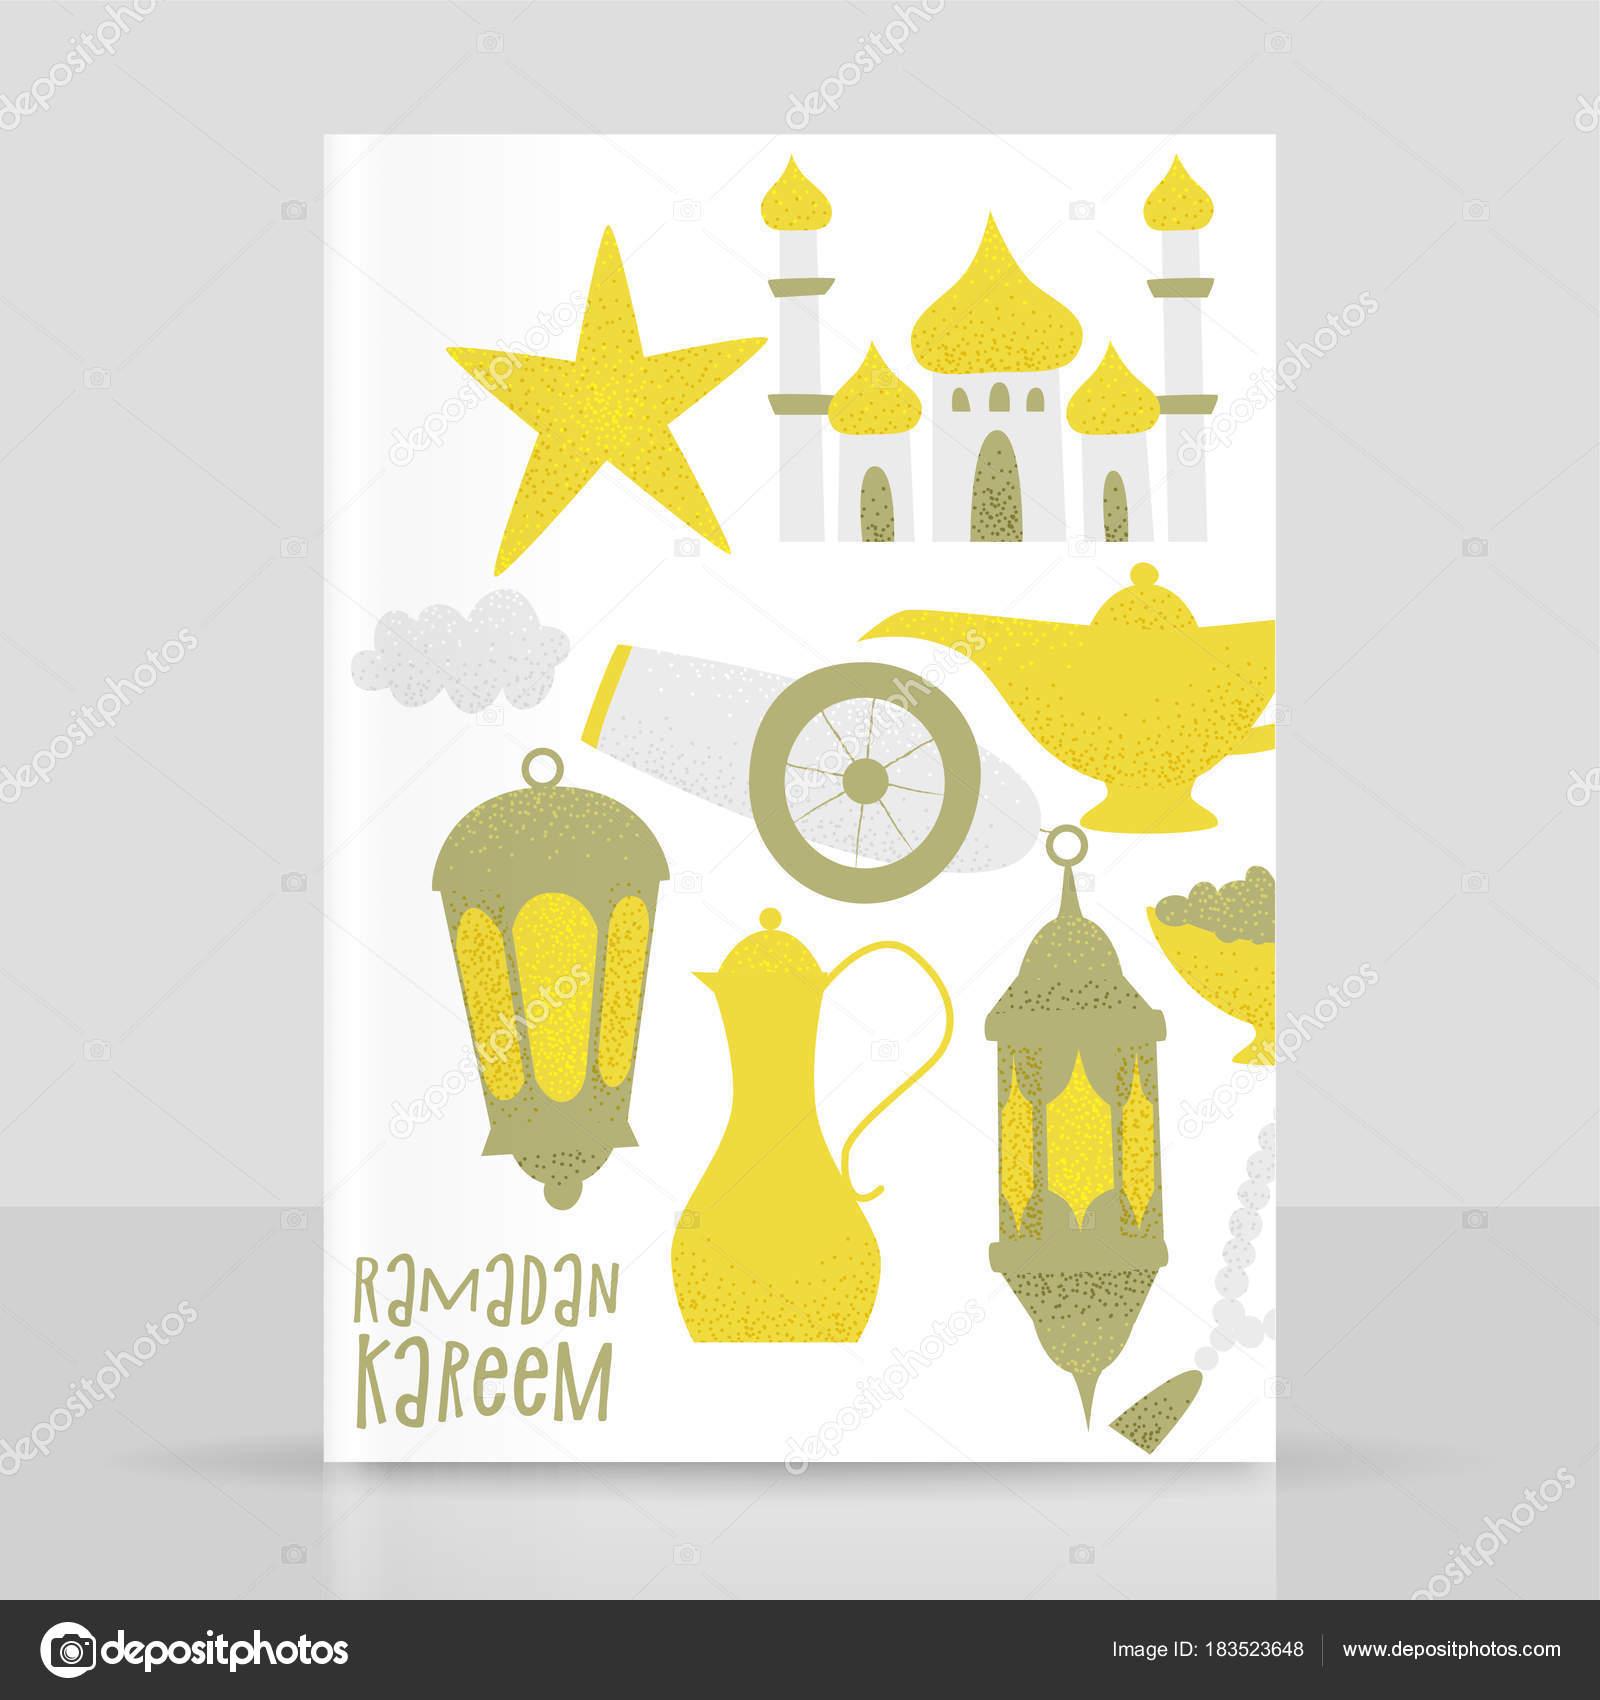 Ramadan Kareem Template Golden Lanterns Mosque Icons White